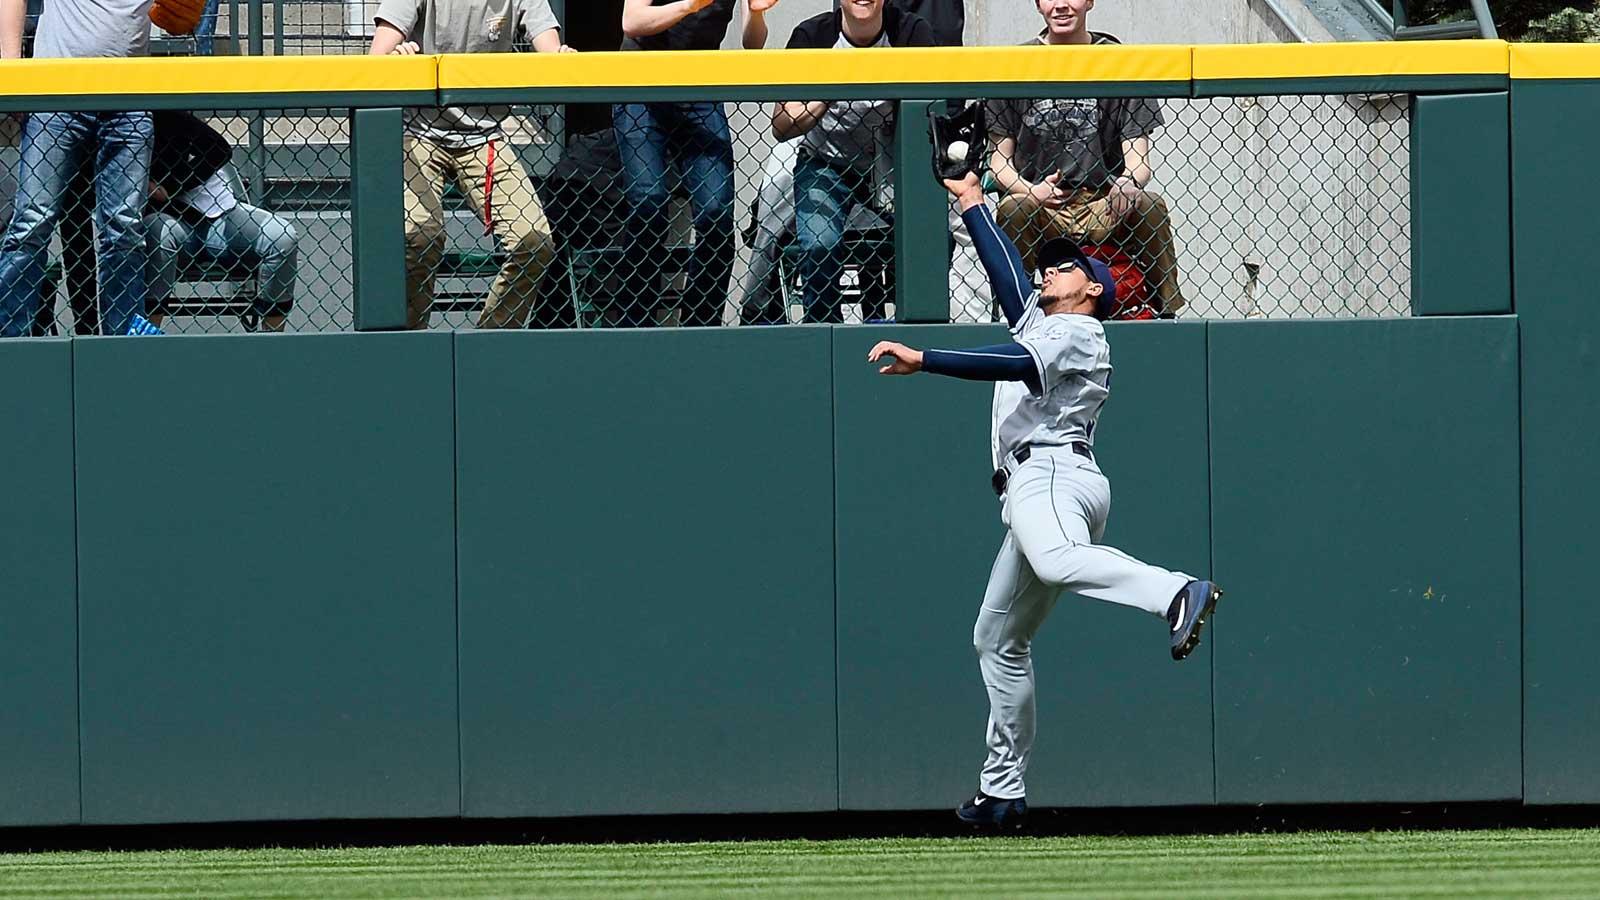 Padres fall to Rockies as Story hits 7th homer